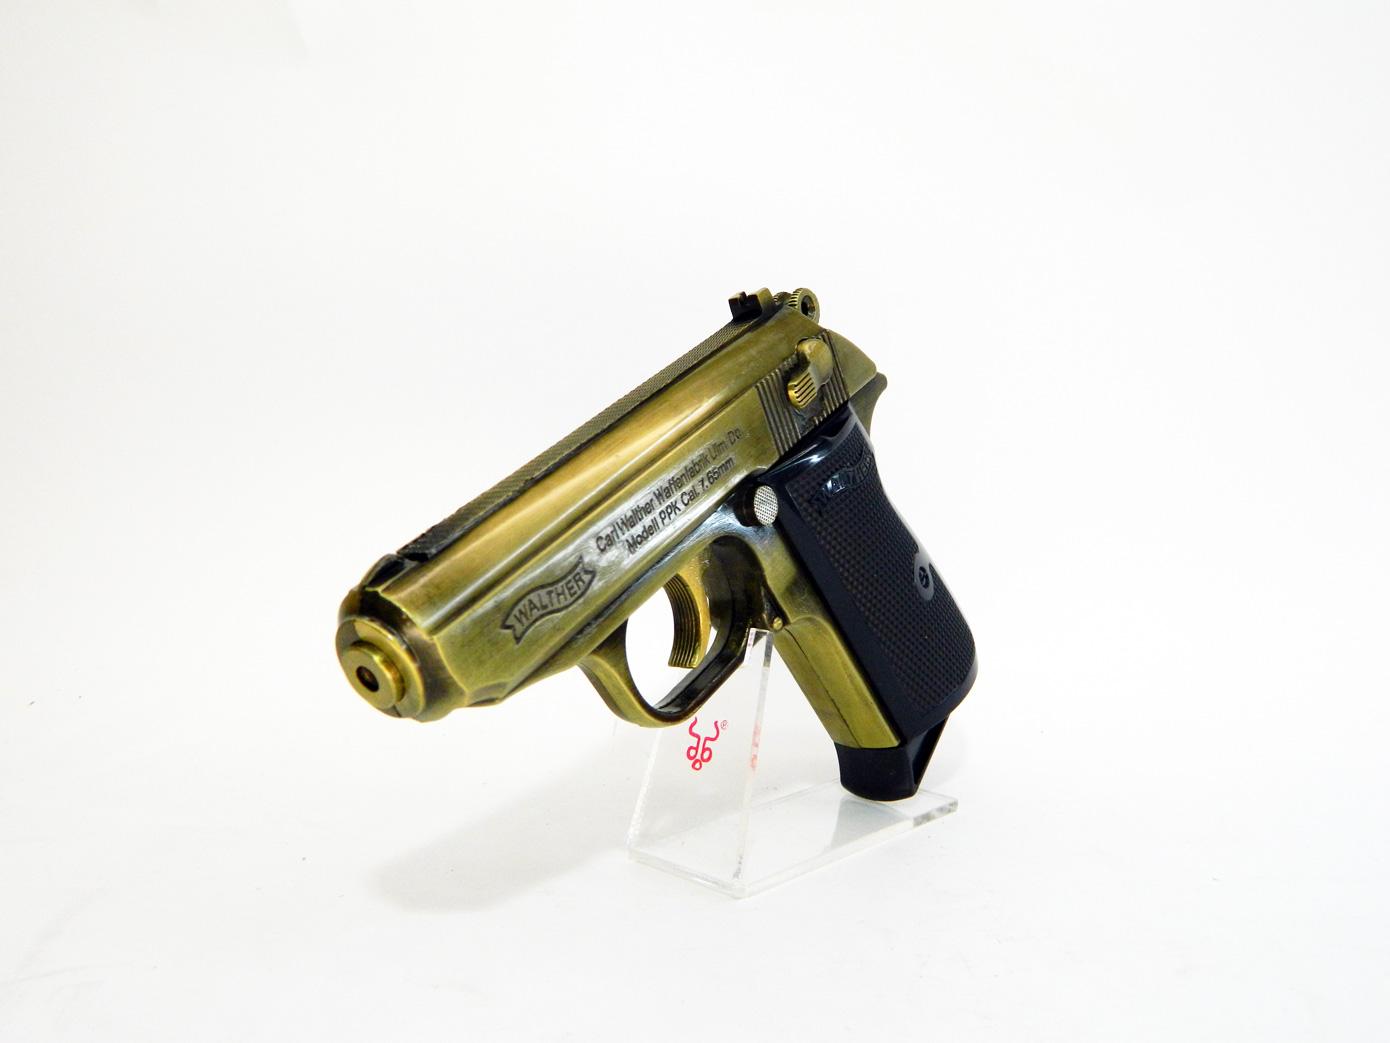 Пистолет Walther PPK/S бронза изображение 0